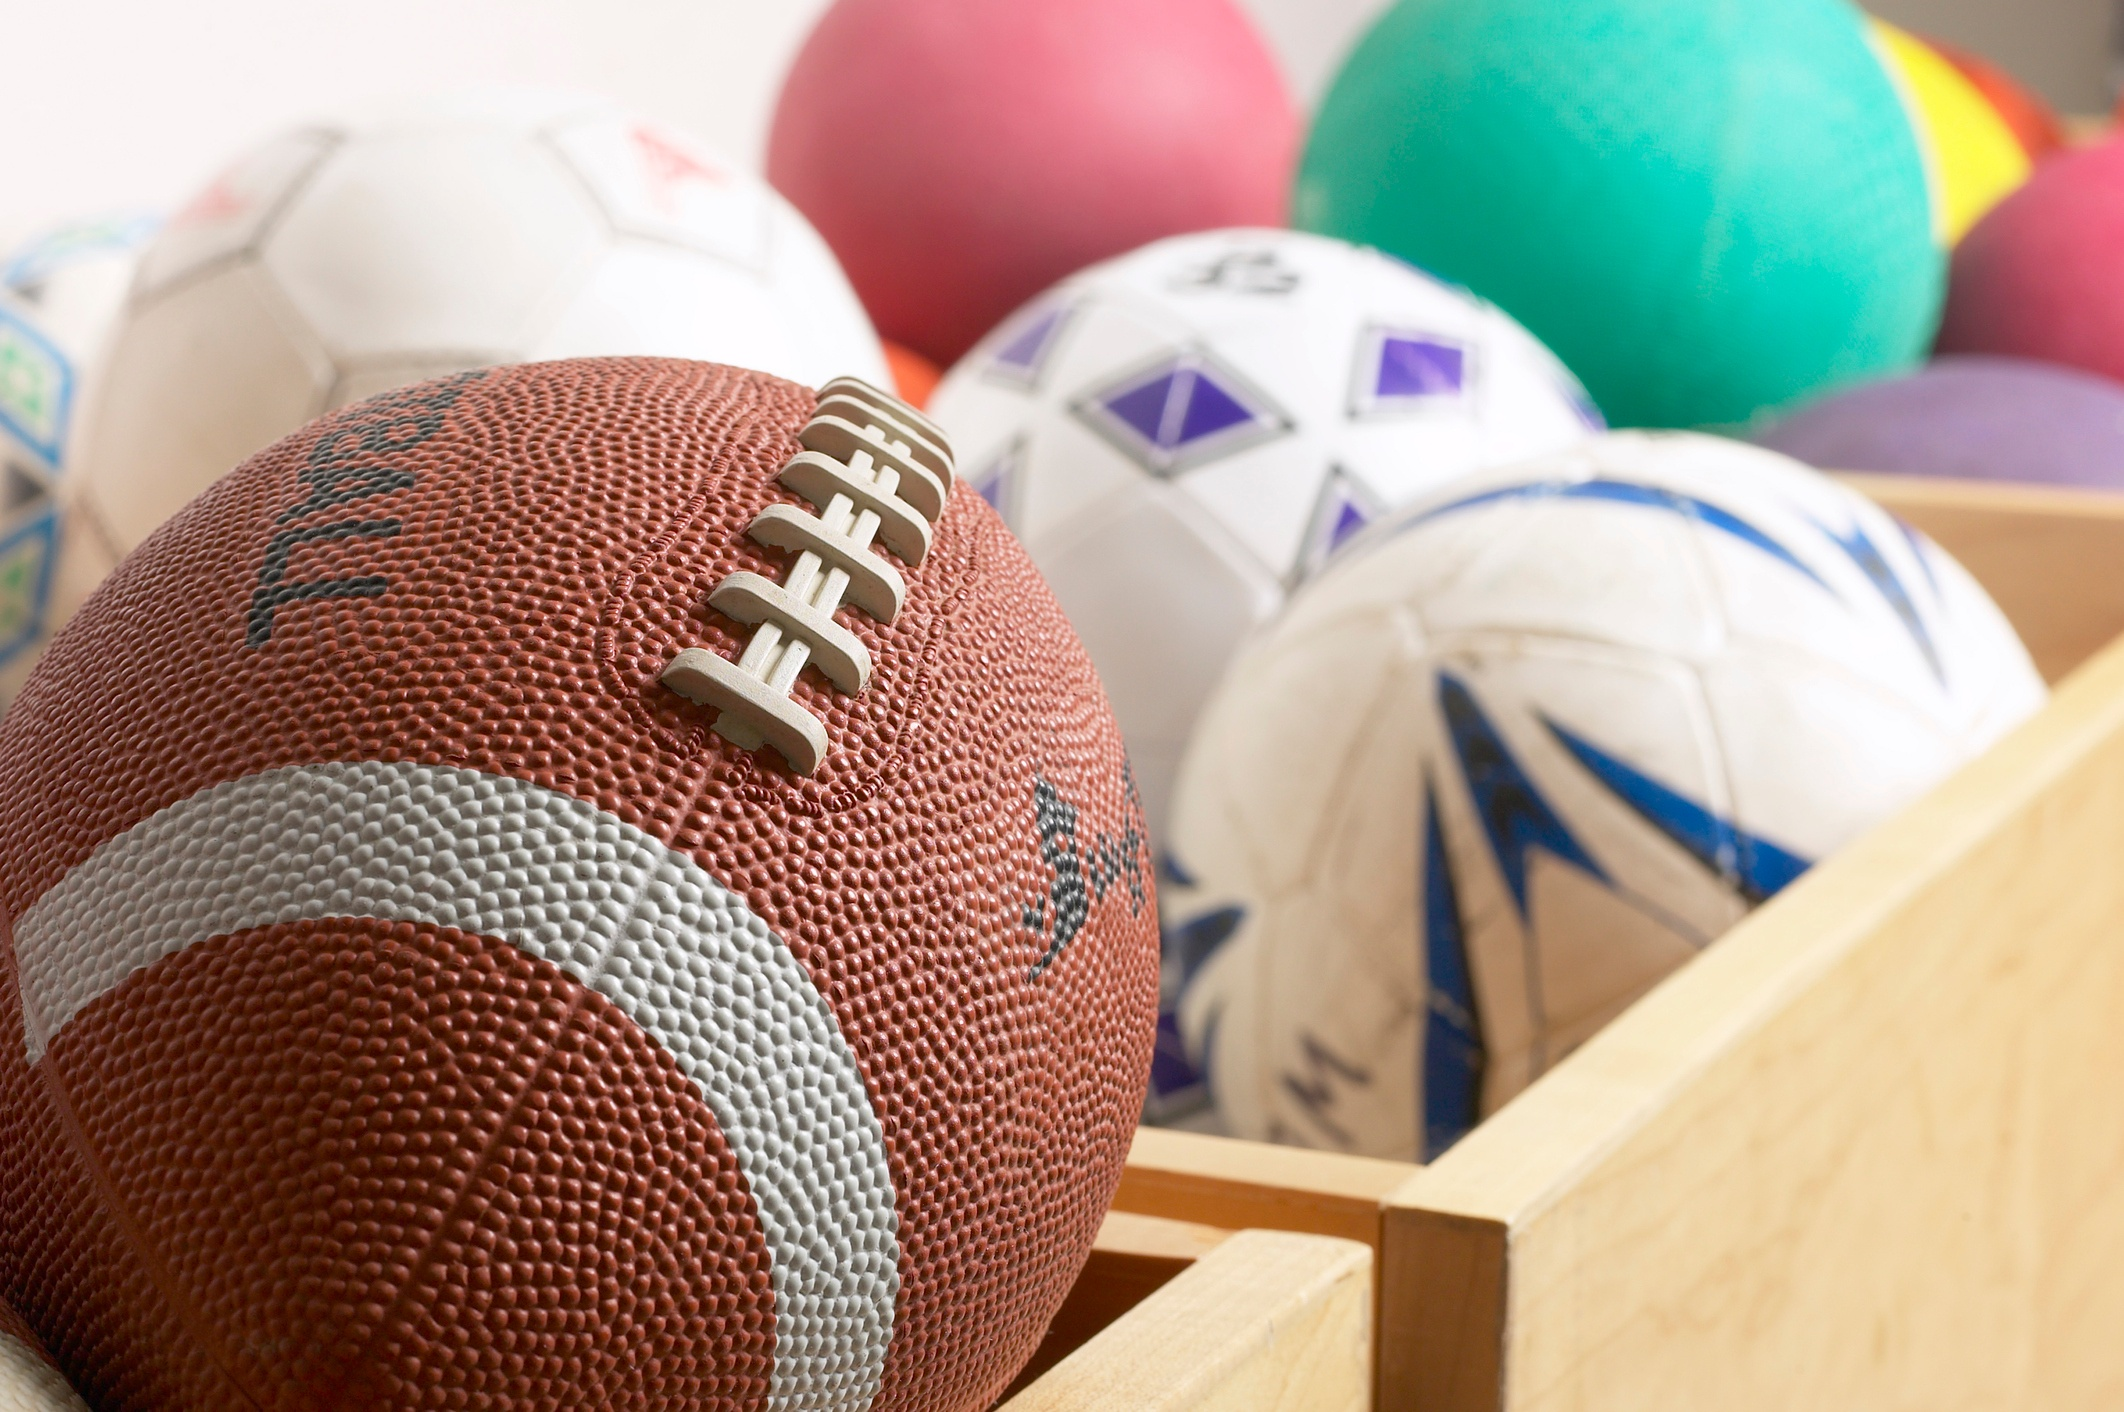 Organizing Your Sports Equipment